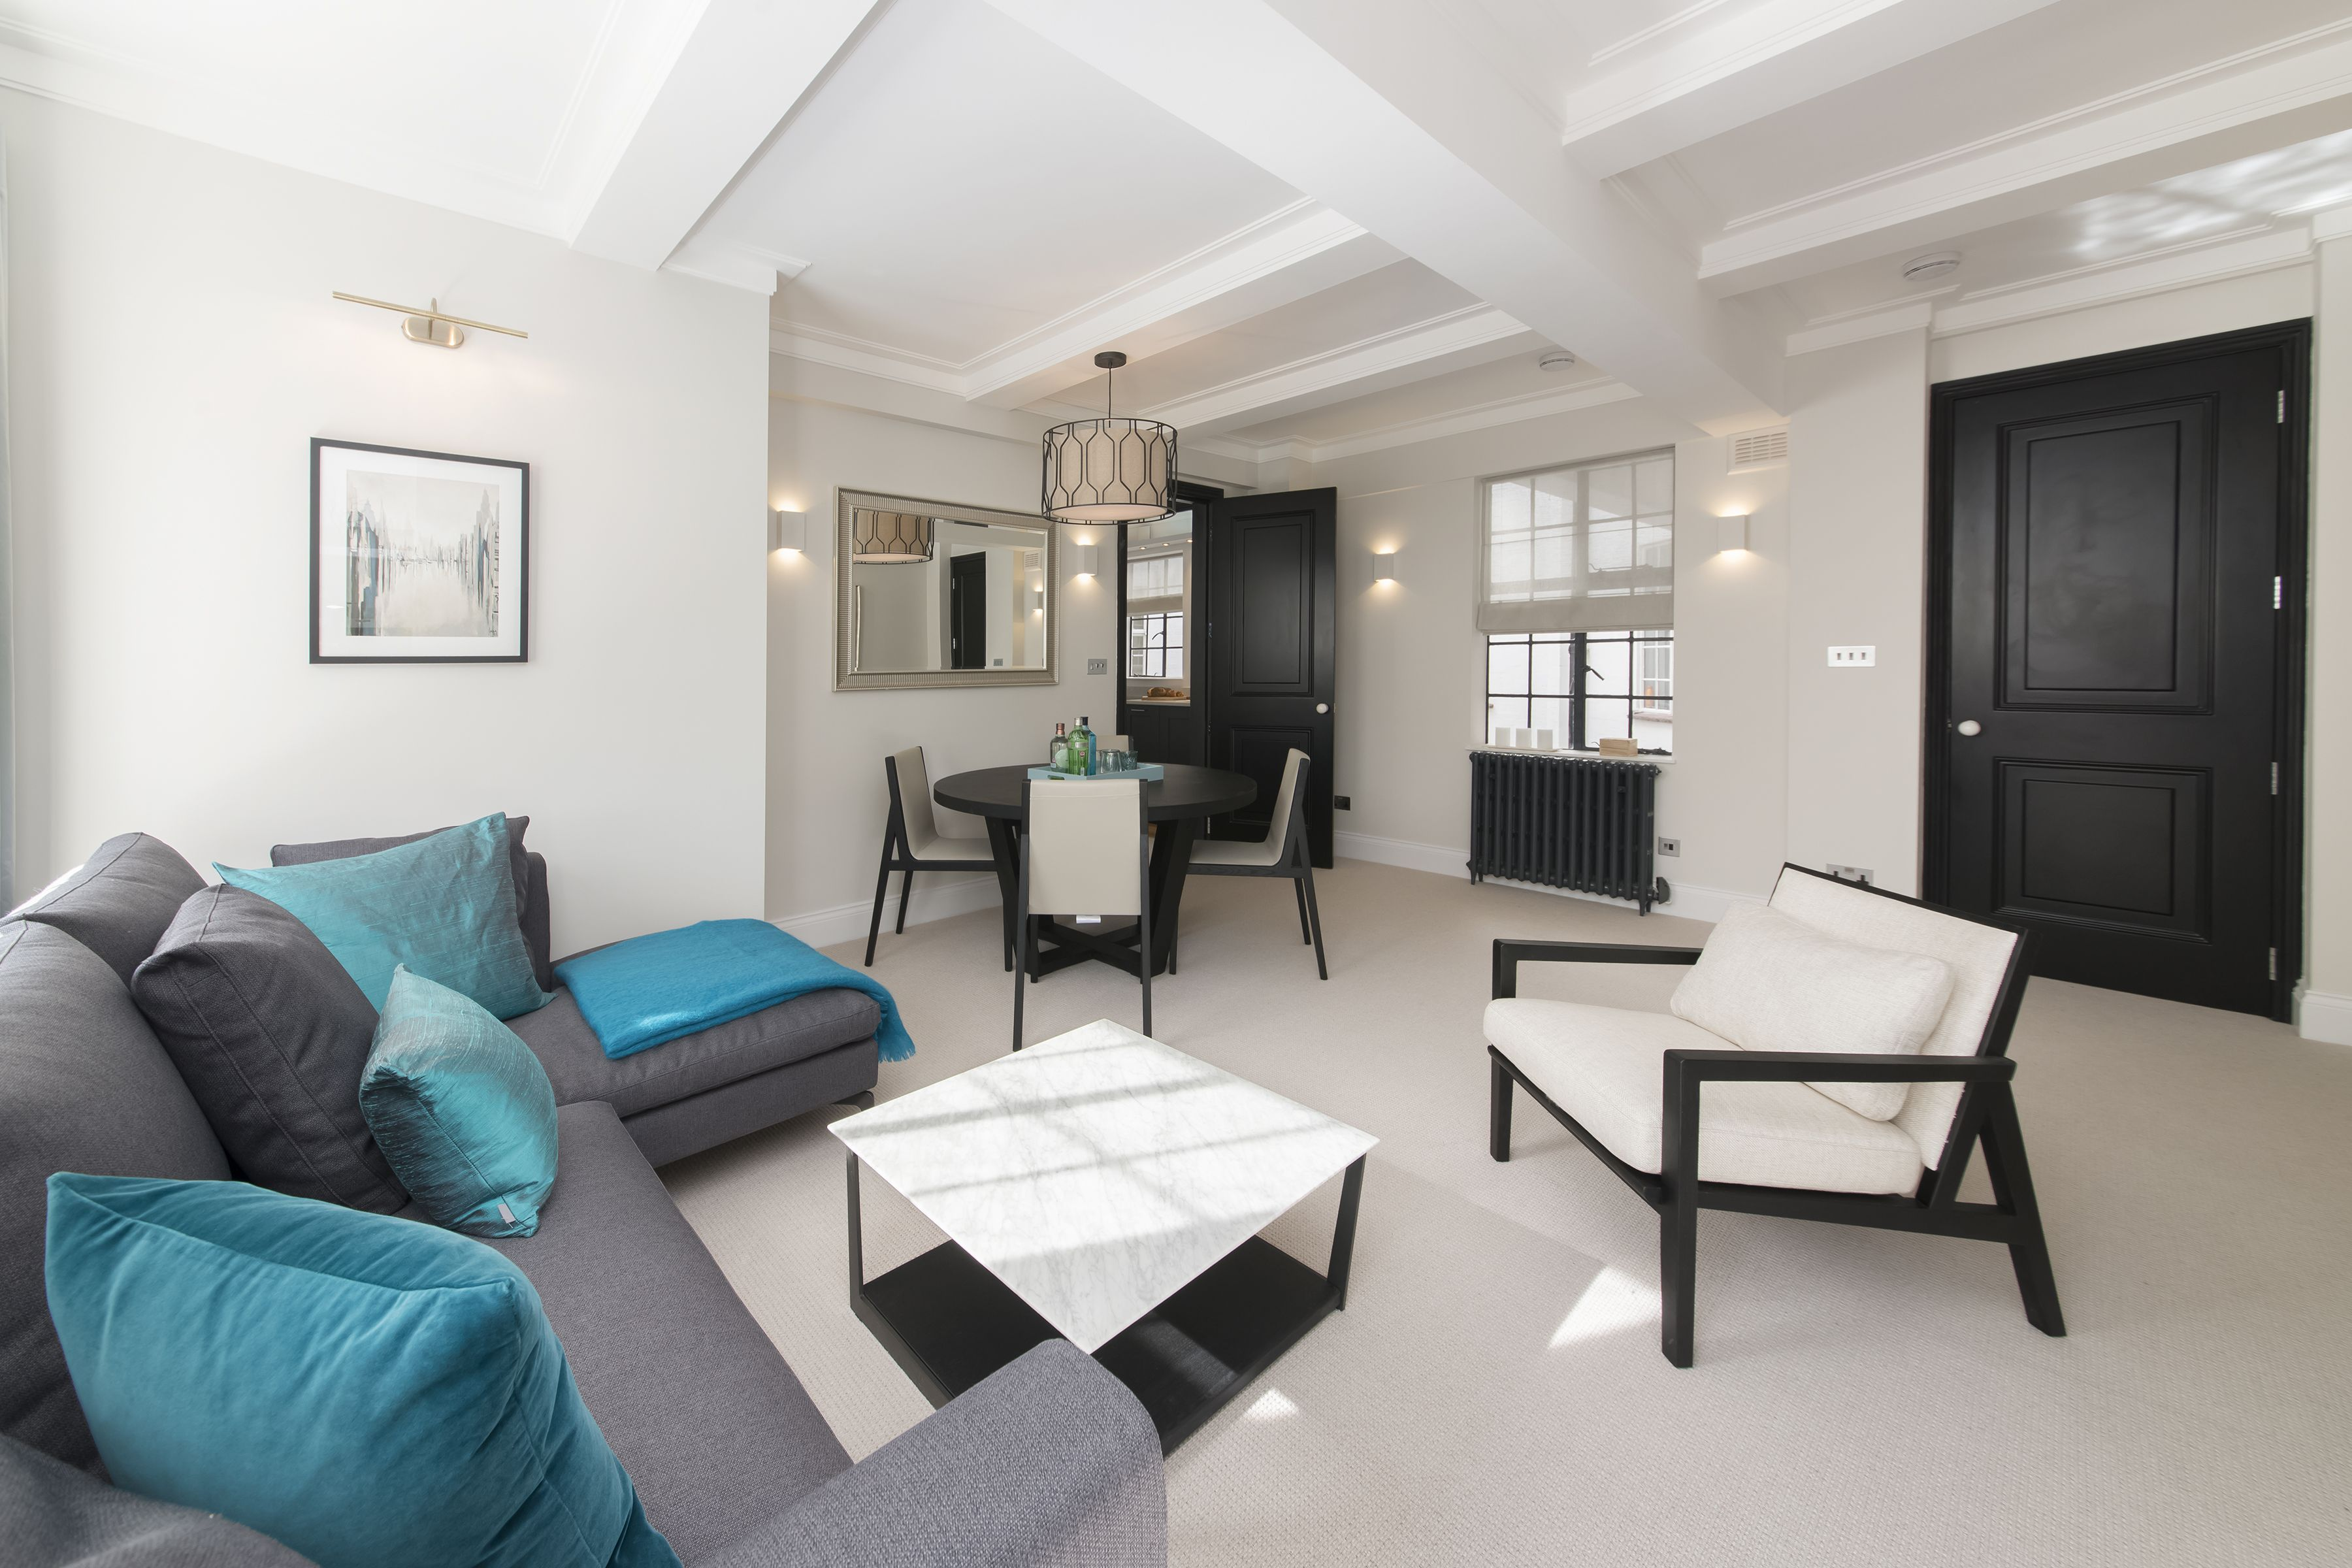 D&G Property Developers Location Chelsea London Pagazzi Interior